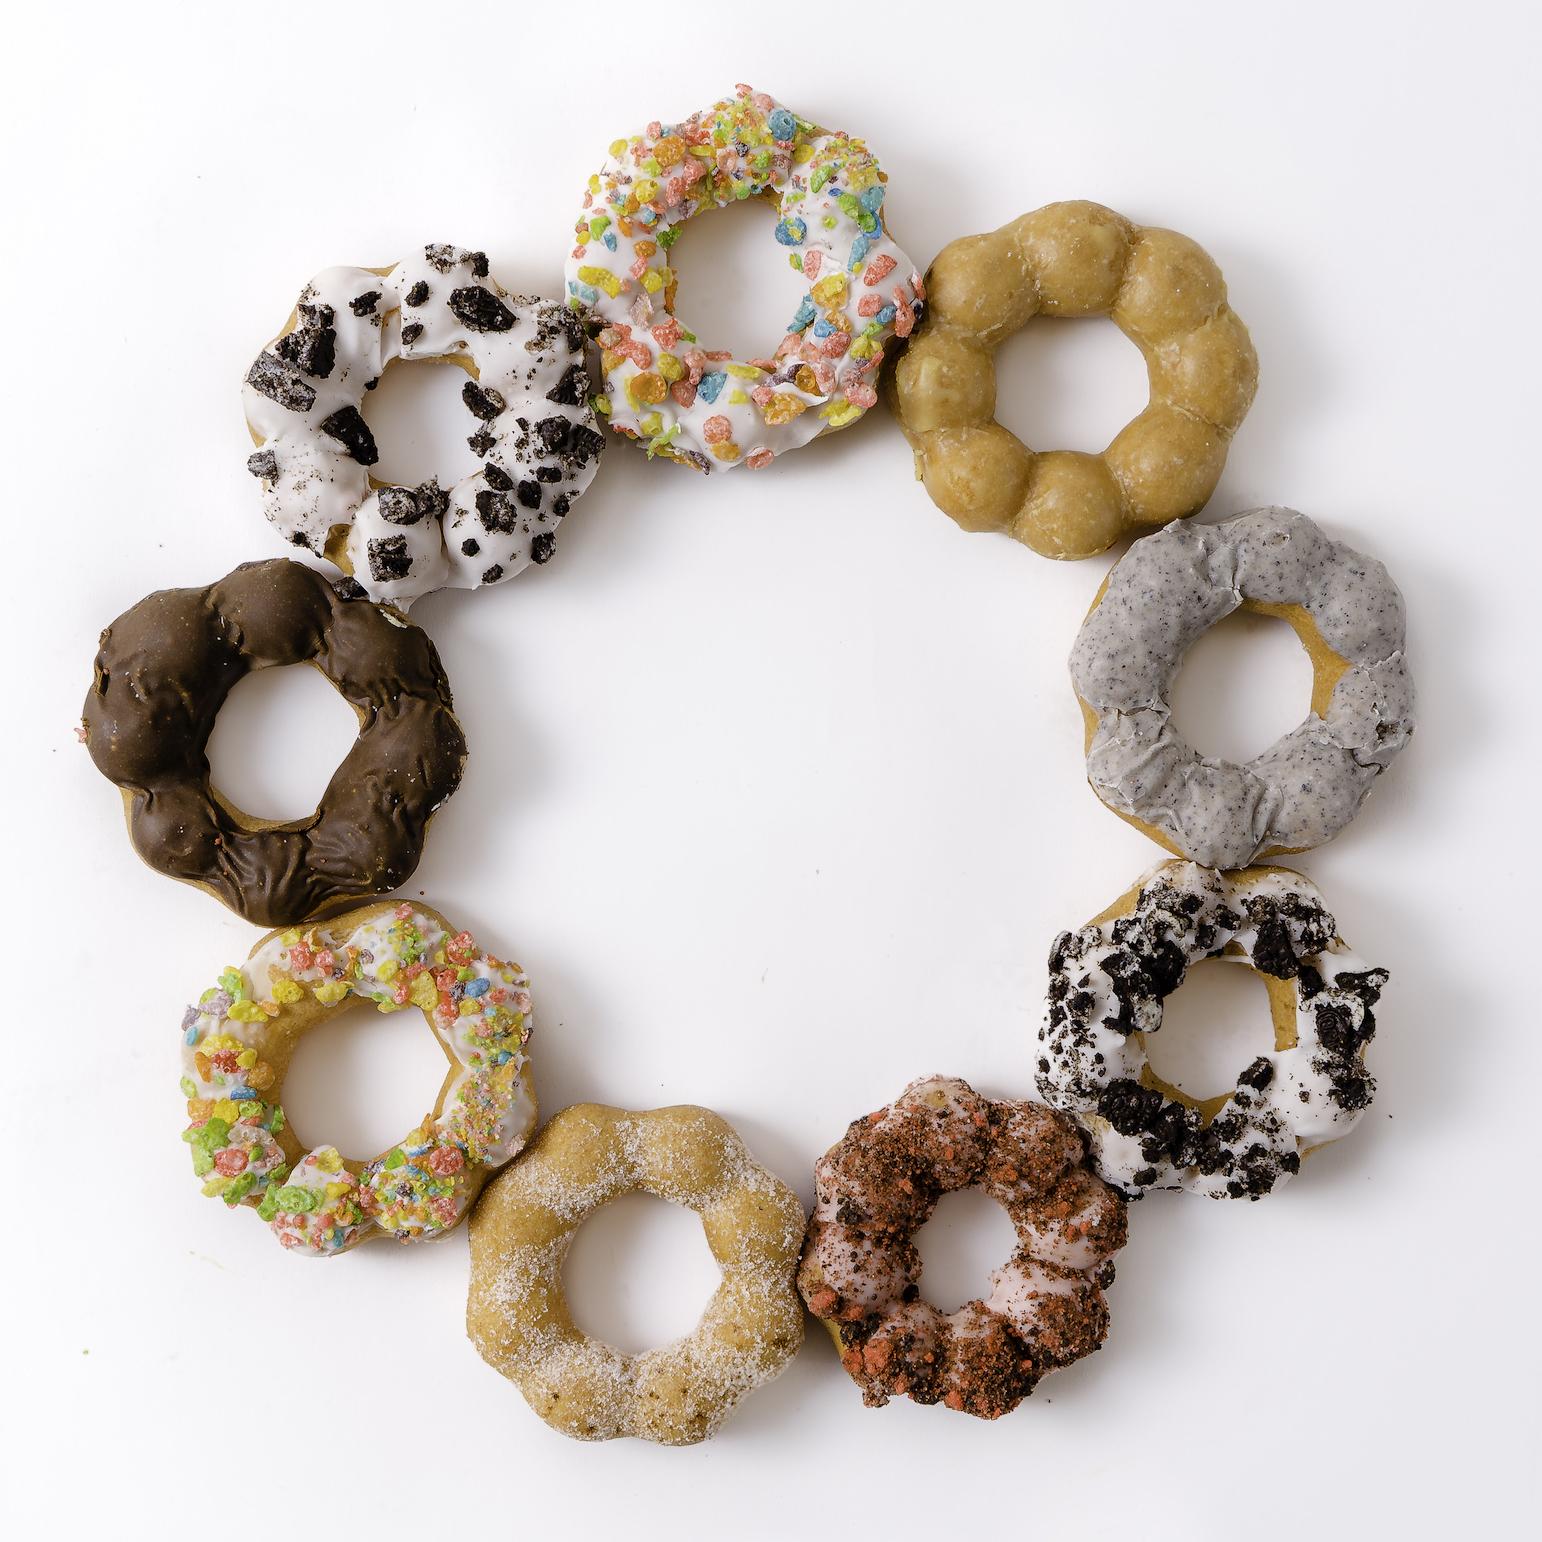 Photo of mochi doughnuts in a circle